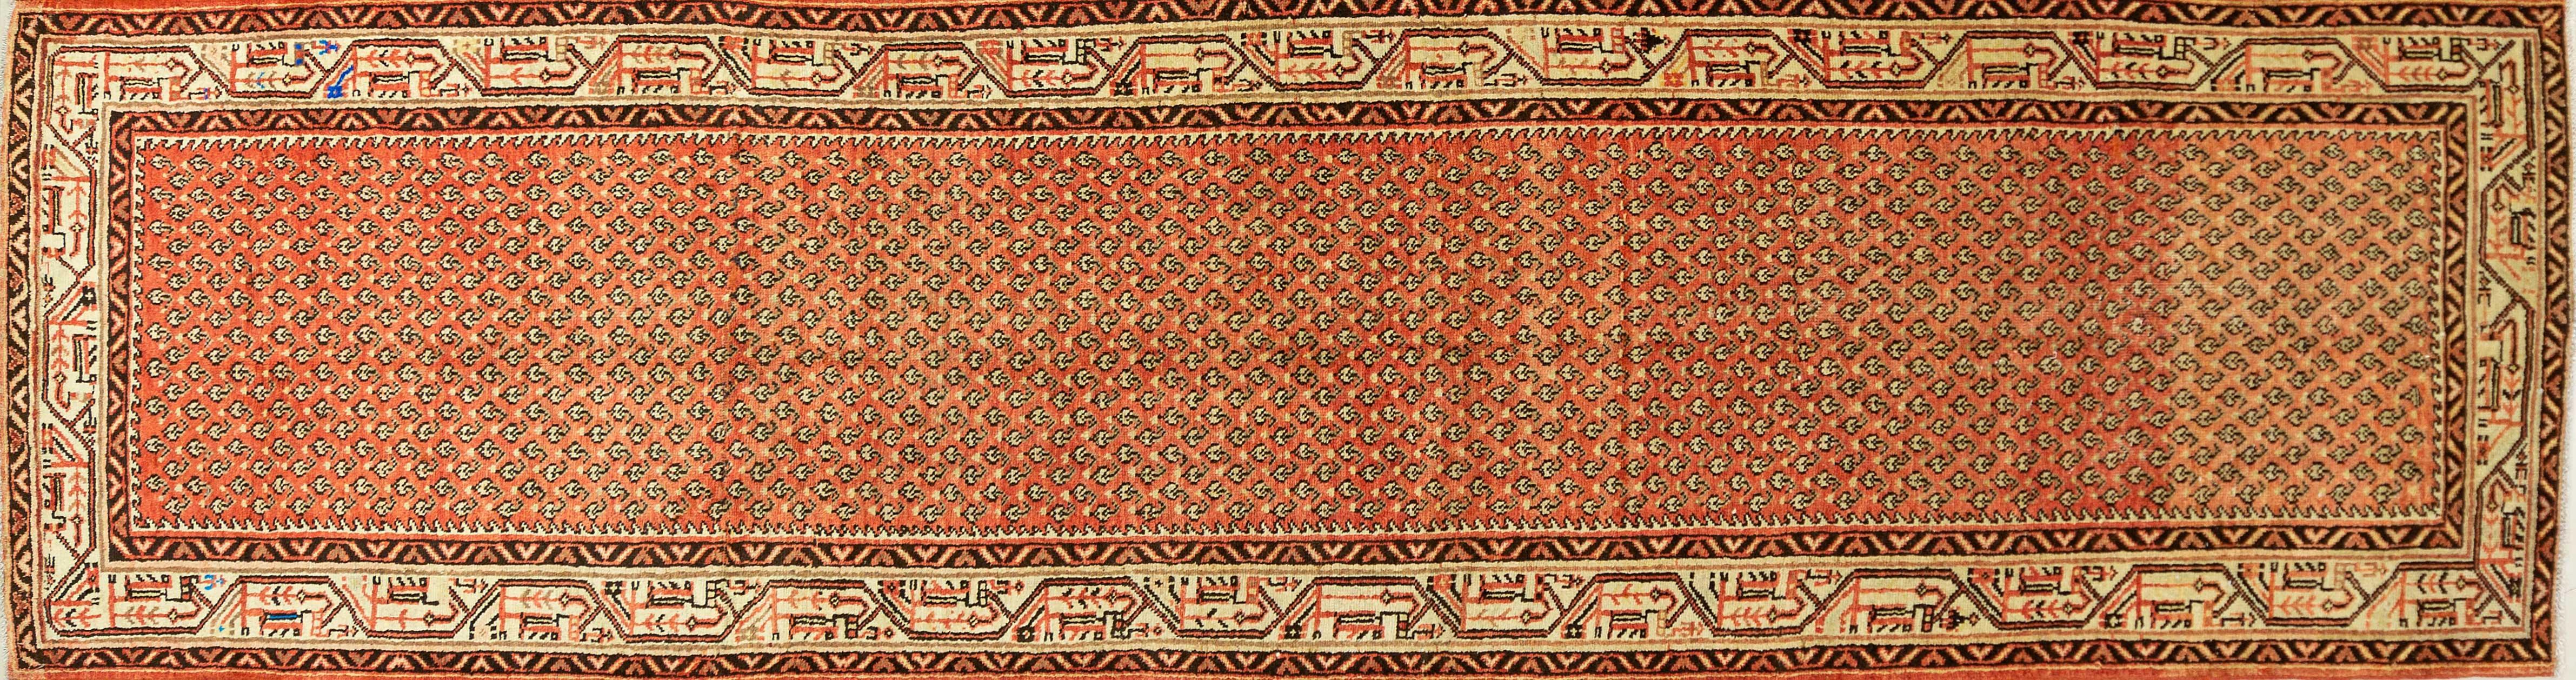 A Persian Hand Knotted Mir Runner, 417 x 105